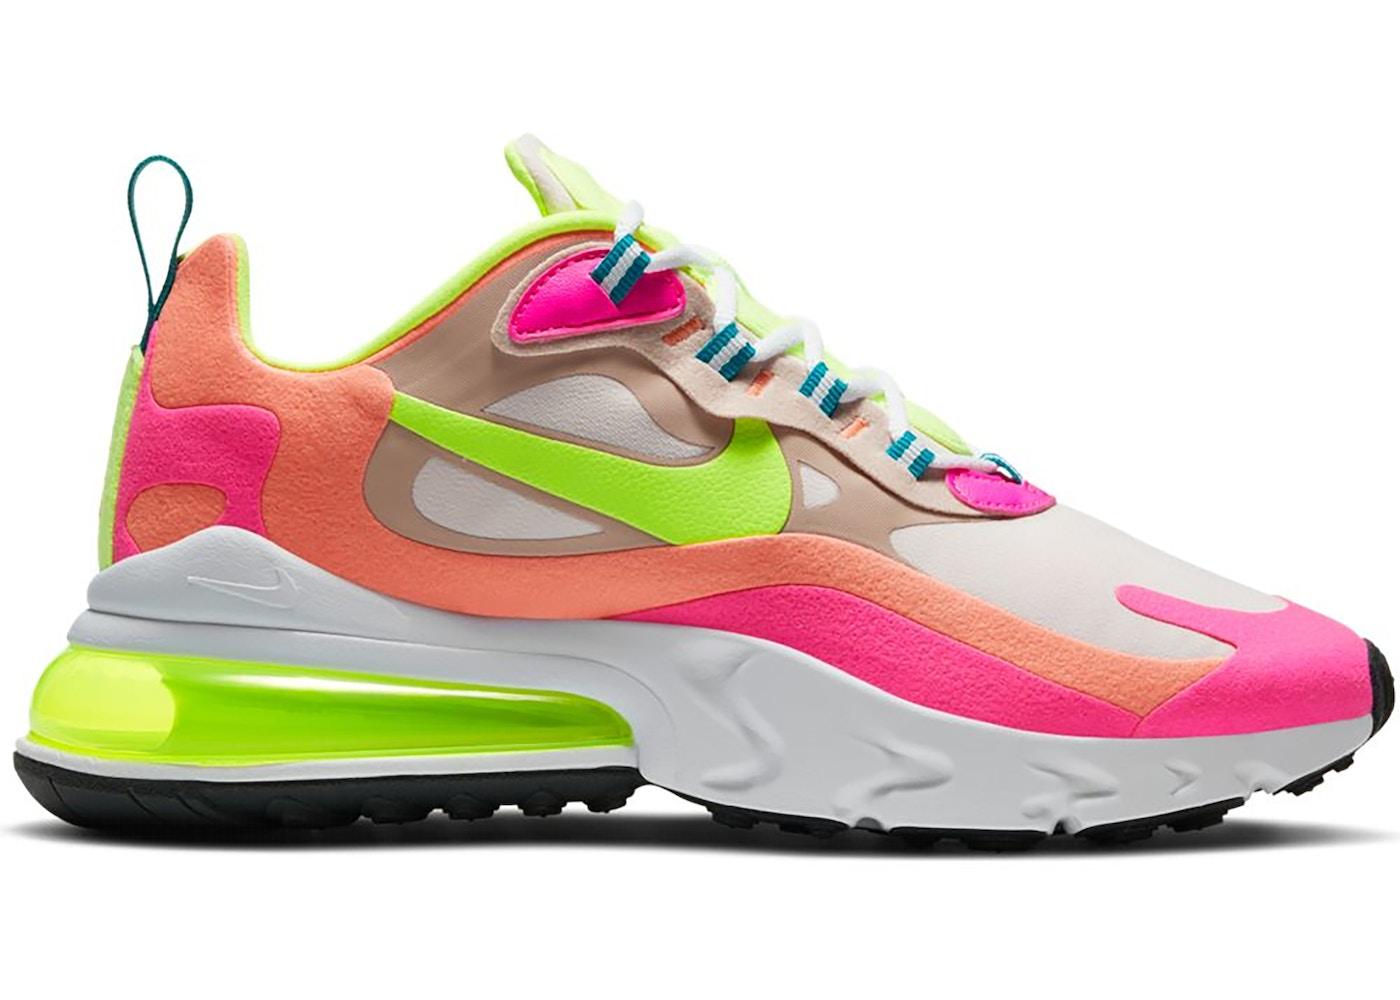 Nike Air Max 270 React Pink Volt